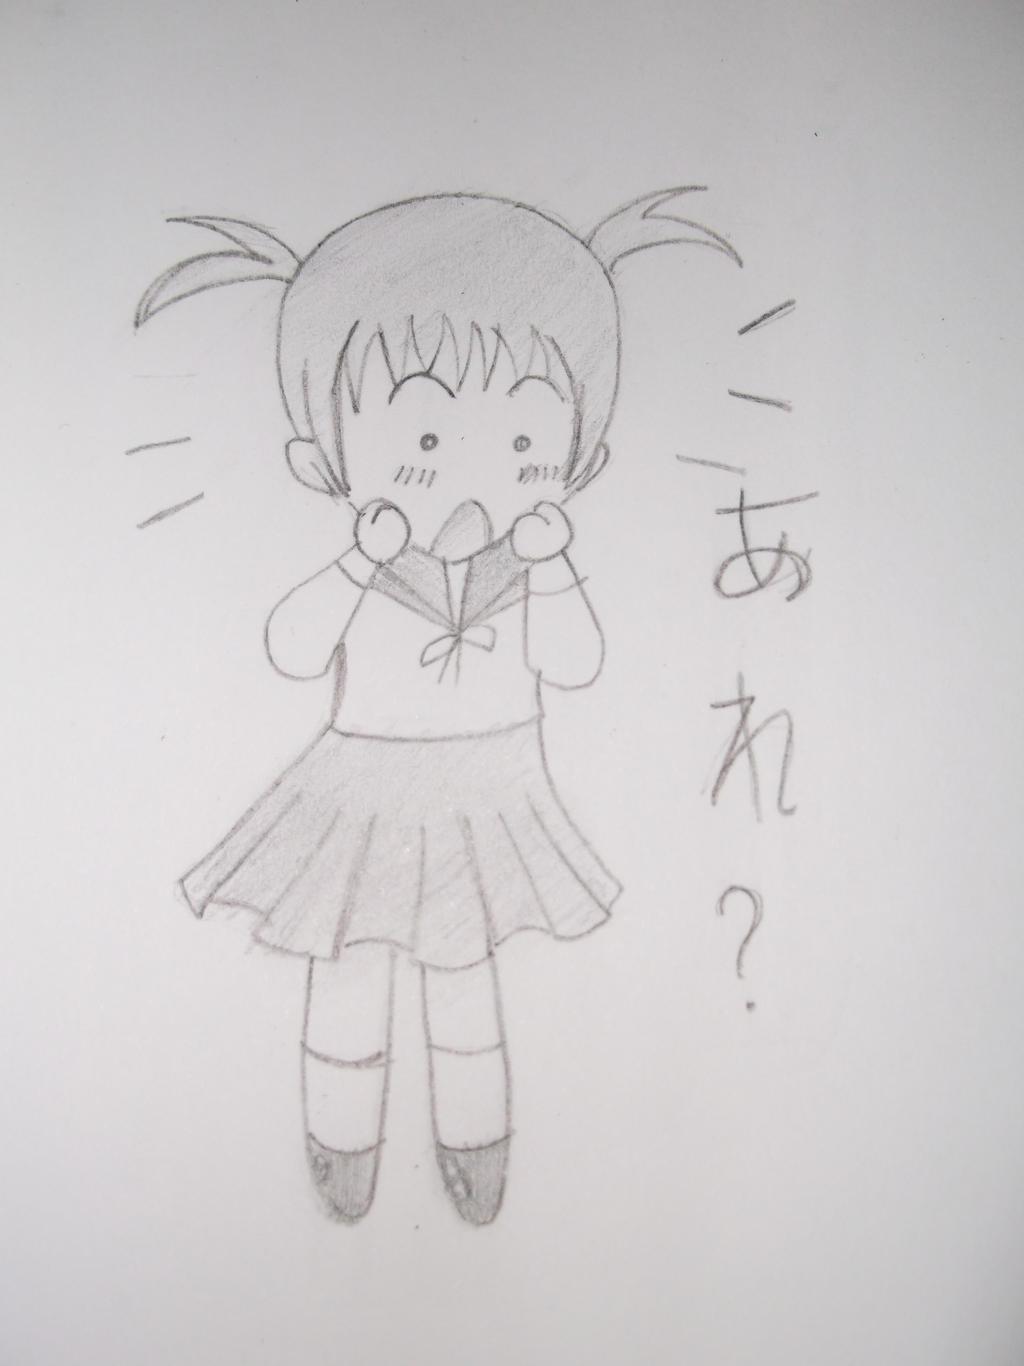 Shocked cartoon anime chibi girl by CoraMay89 on DeviantArt